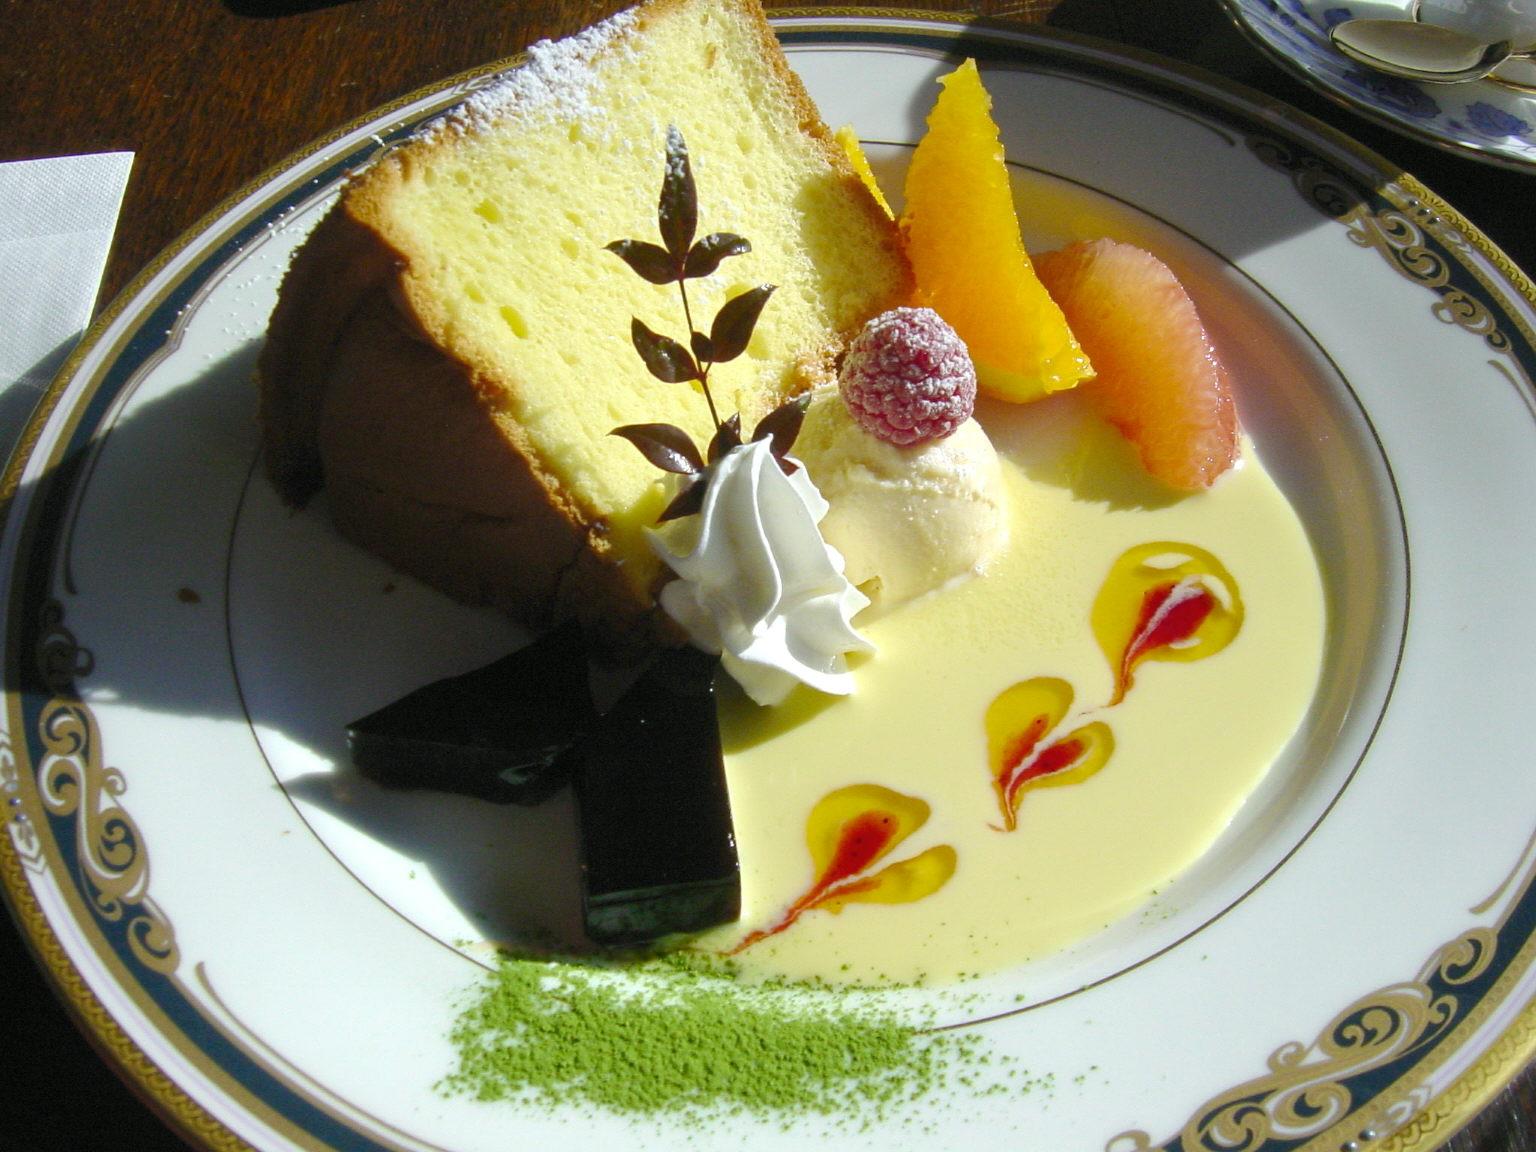 Cafe��gallary ��